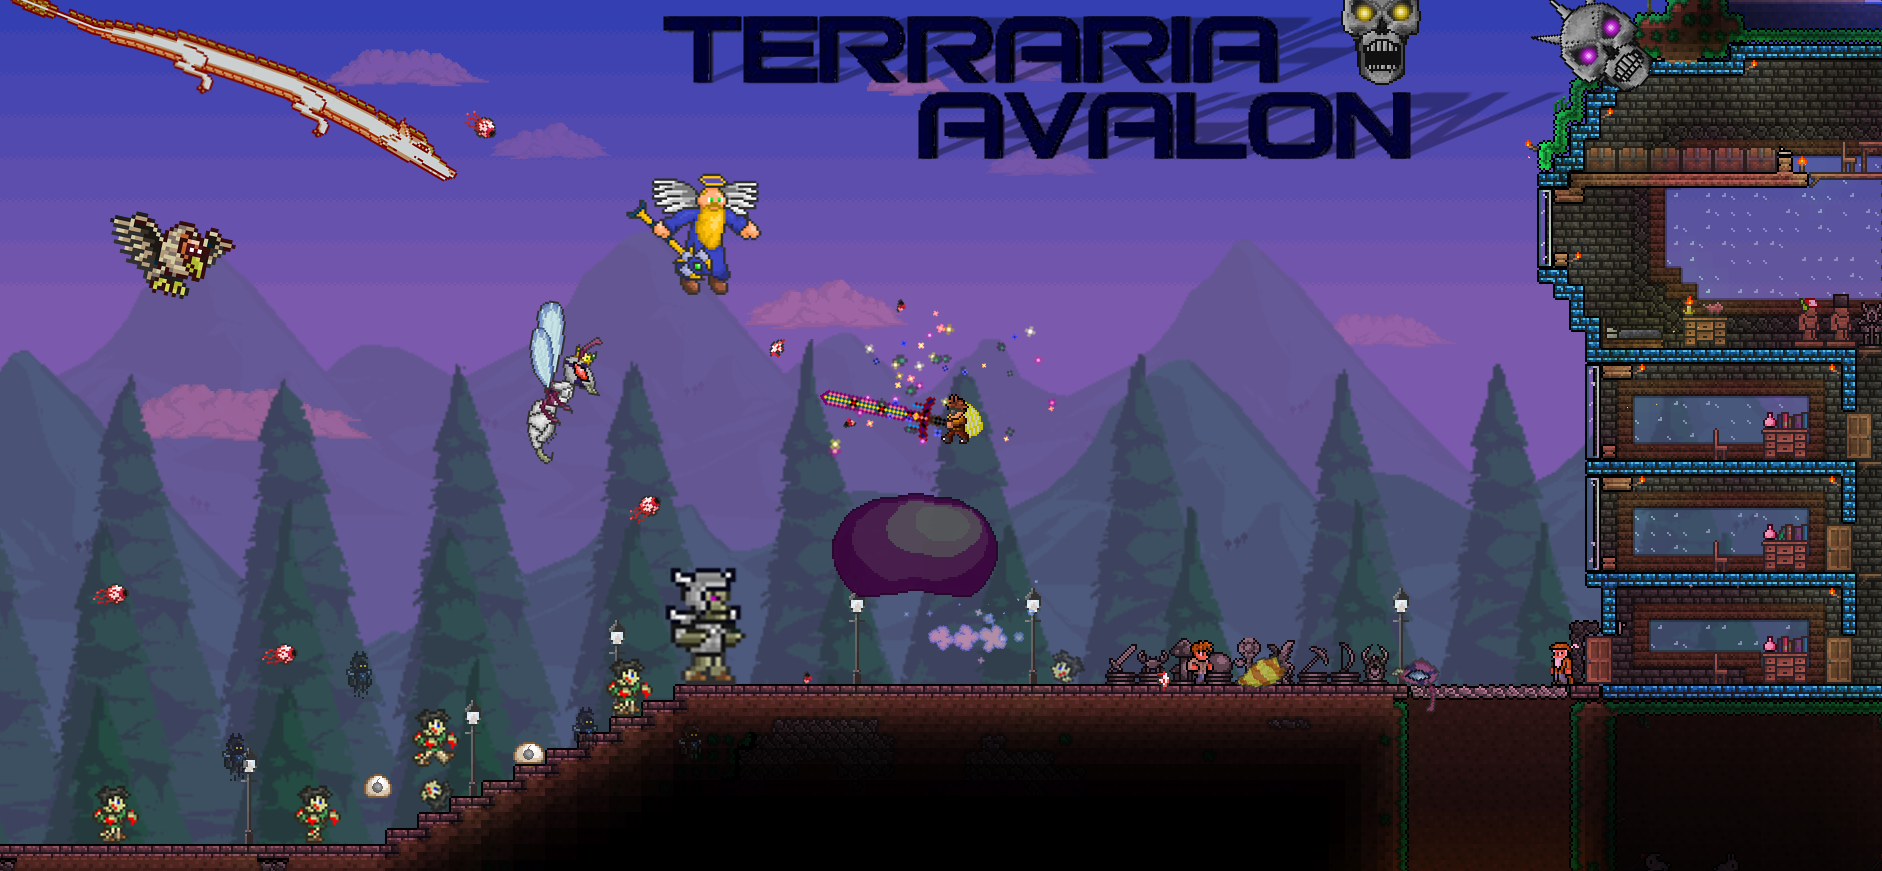 Starbound Inventory Editor Mod Terraria Pc - pokscast